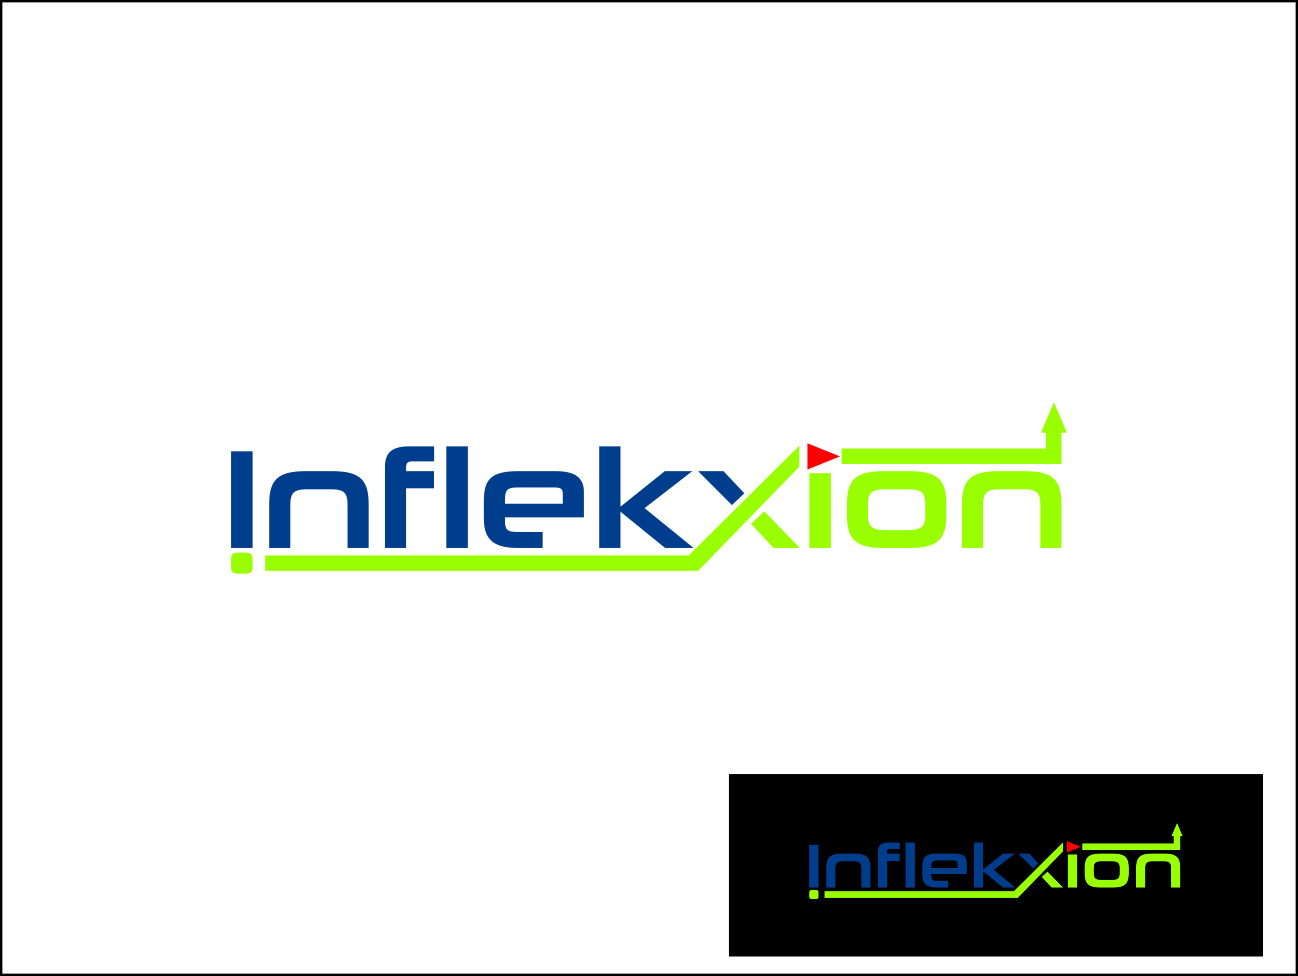 Logo Design by Agus Martoyo - Entry No. 52 in the Logo Design Contest Professional Logo Design for Inflekxion.